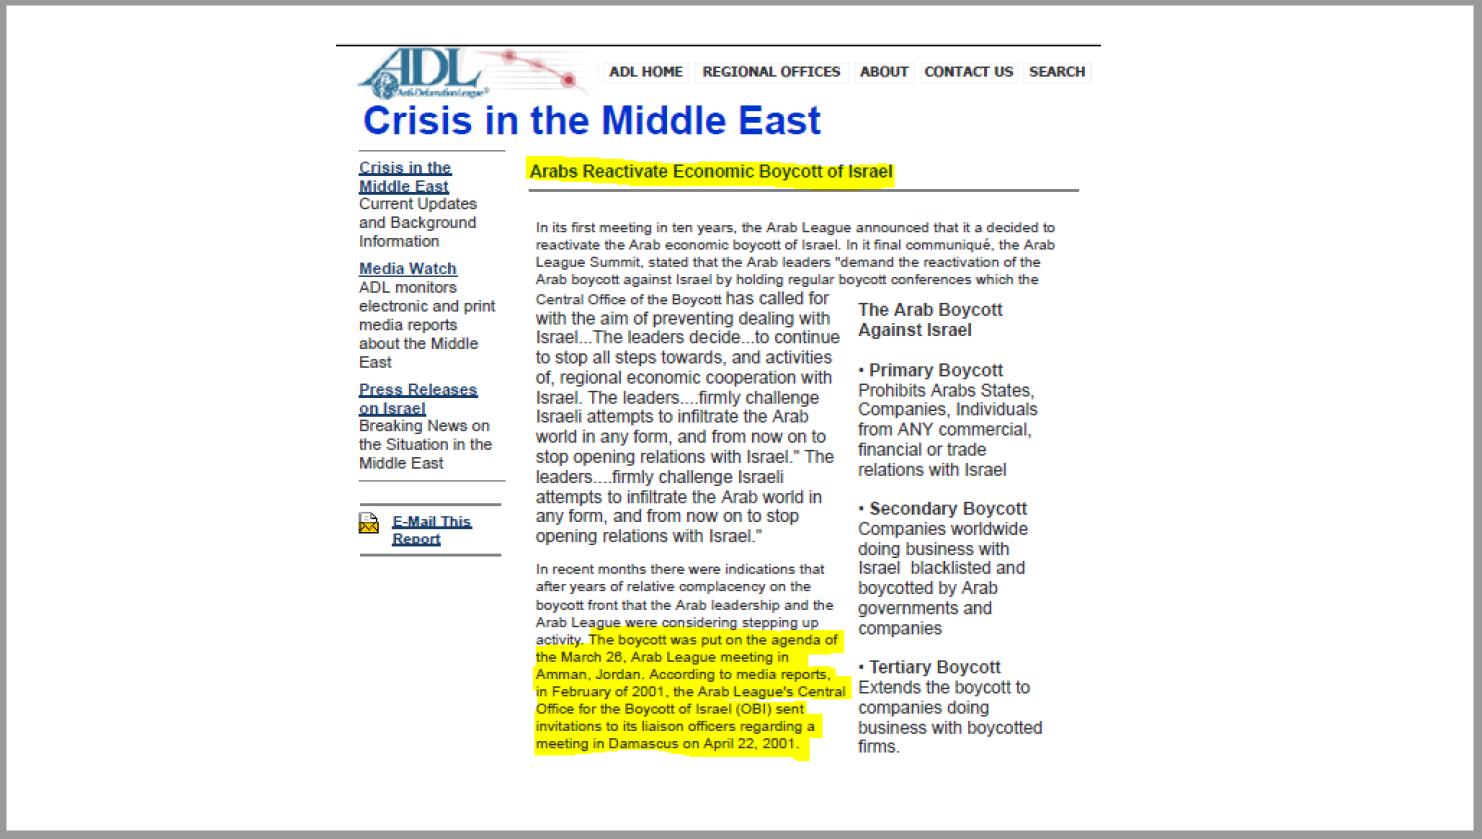 bds-history-slide-arab-league-boycott-adl-2001